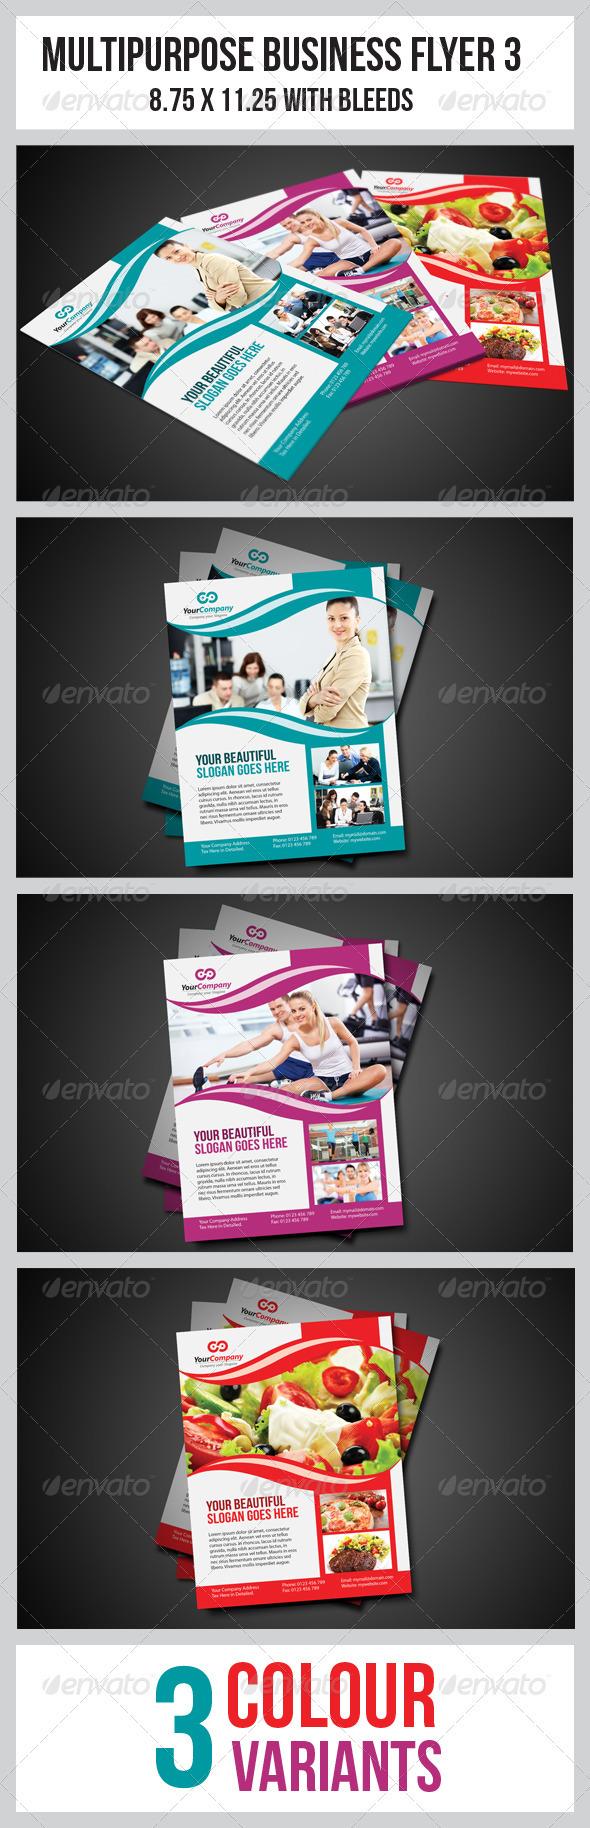 Multipurpose Business Flyer 3 - Commerce Flyers